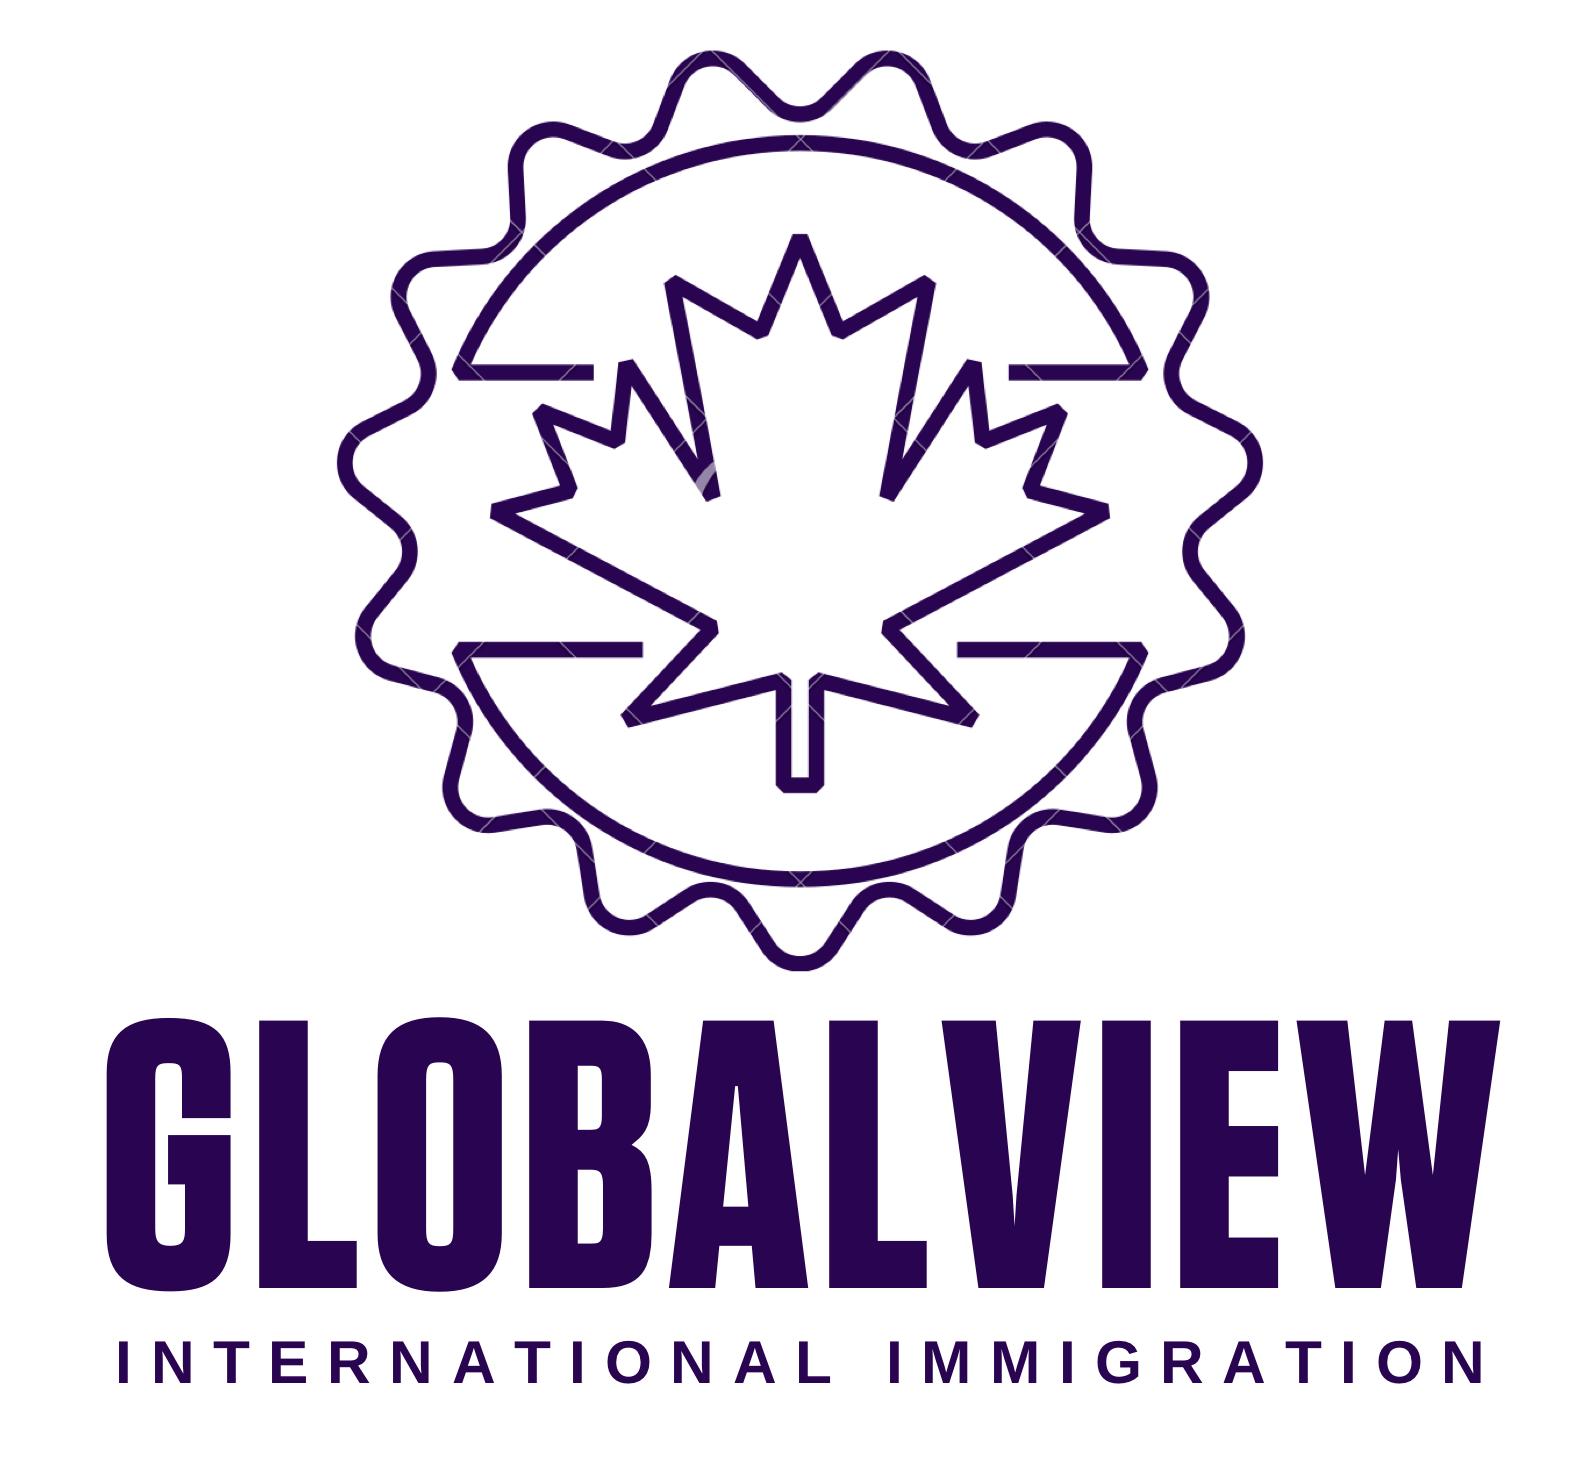 Canada Globalview International Immigration